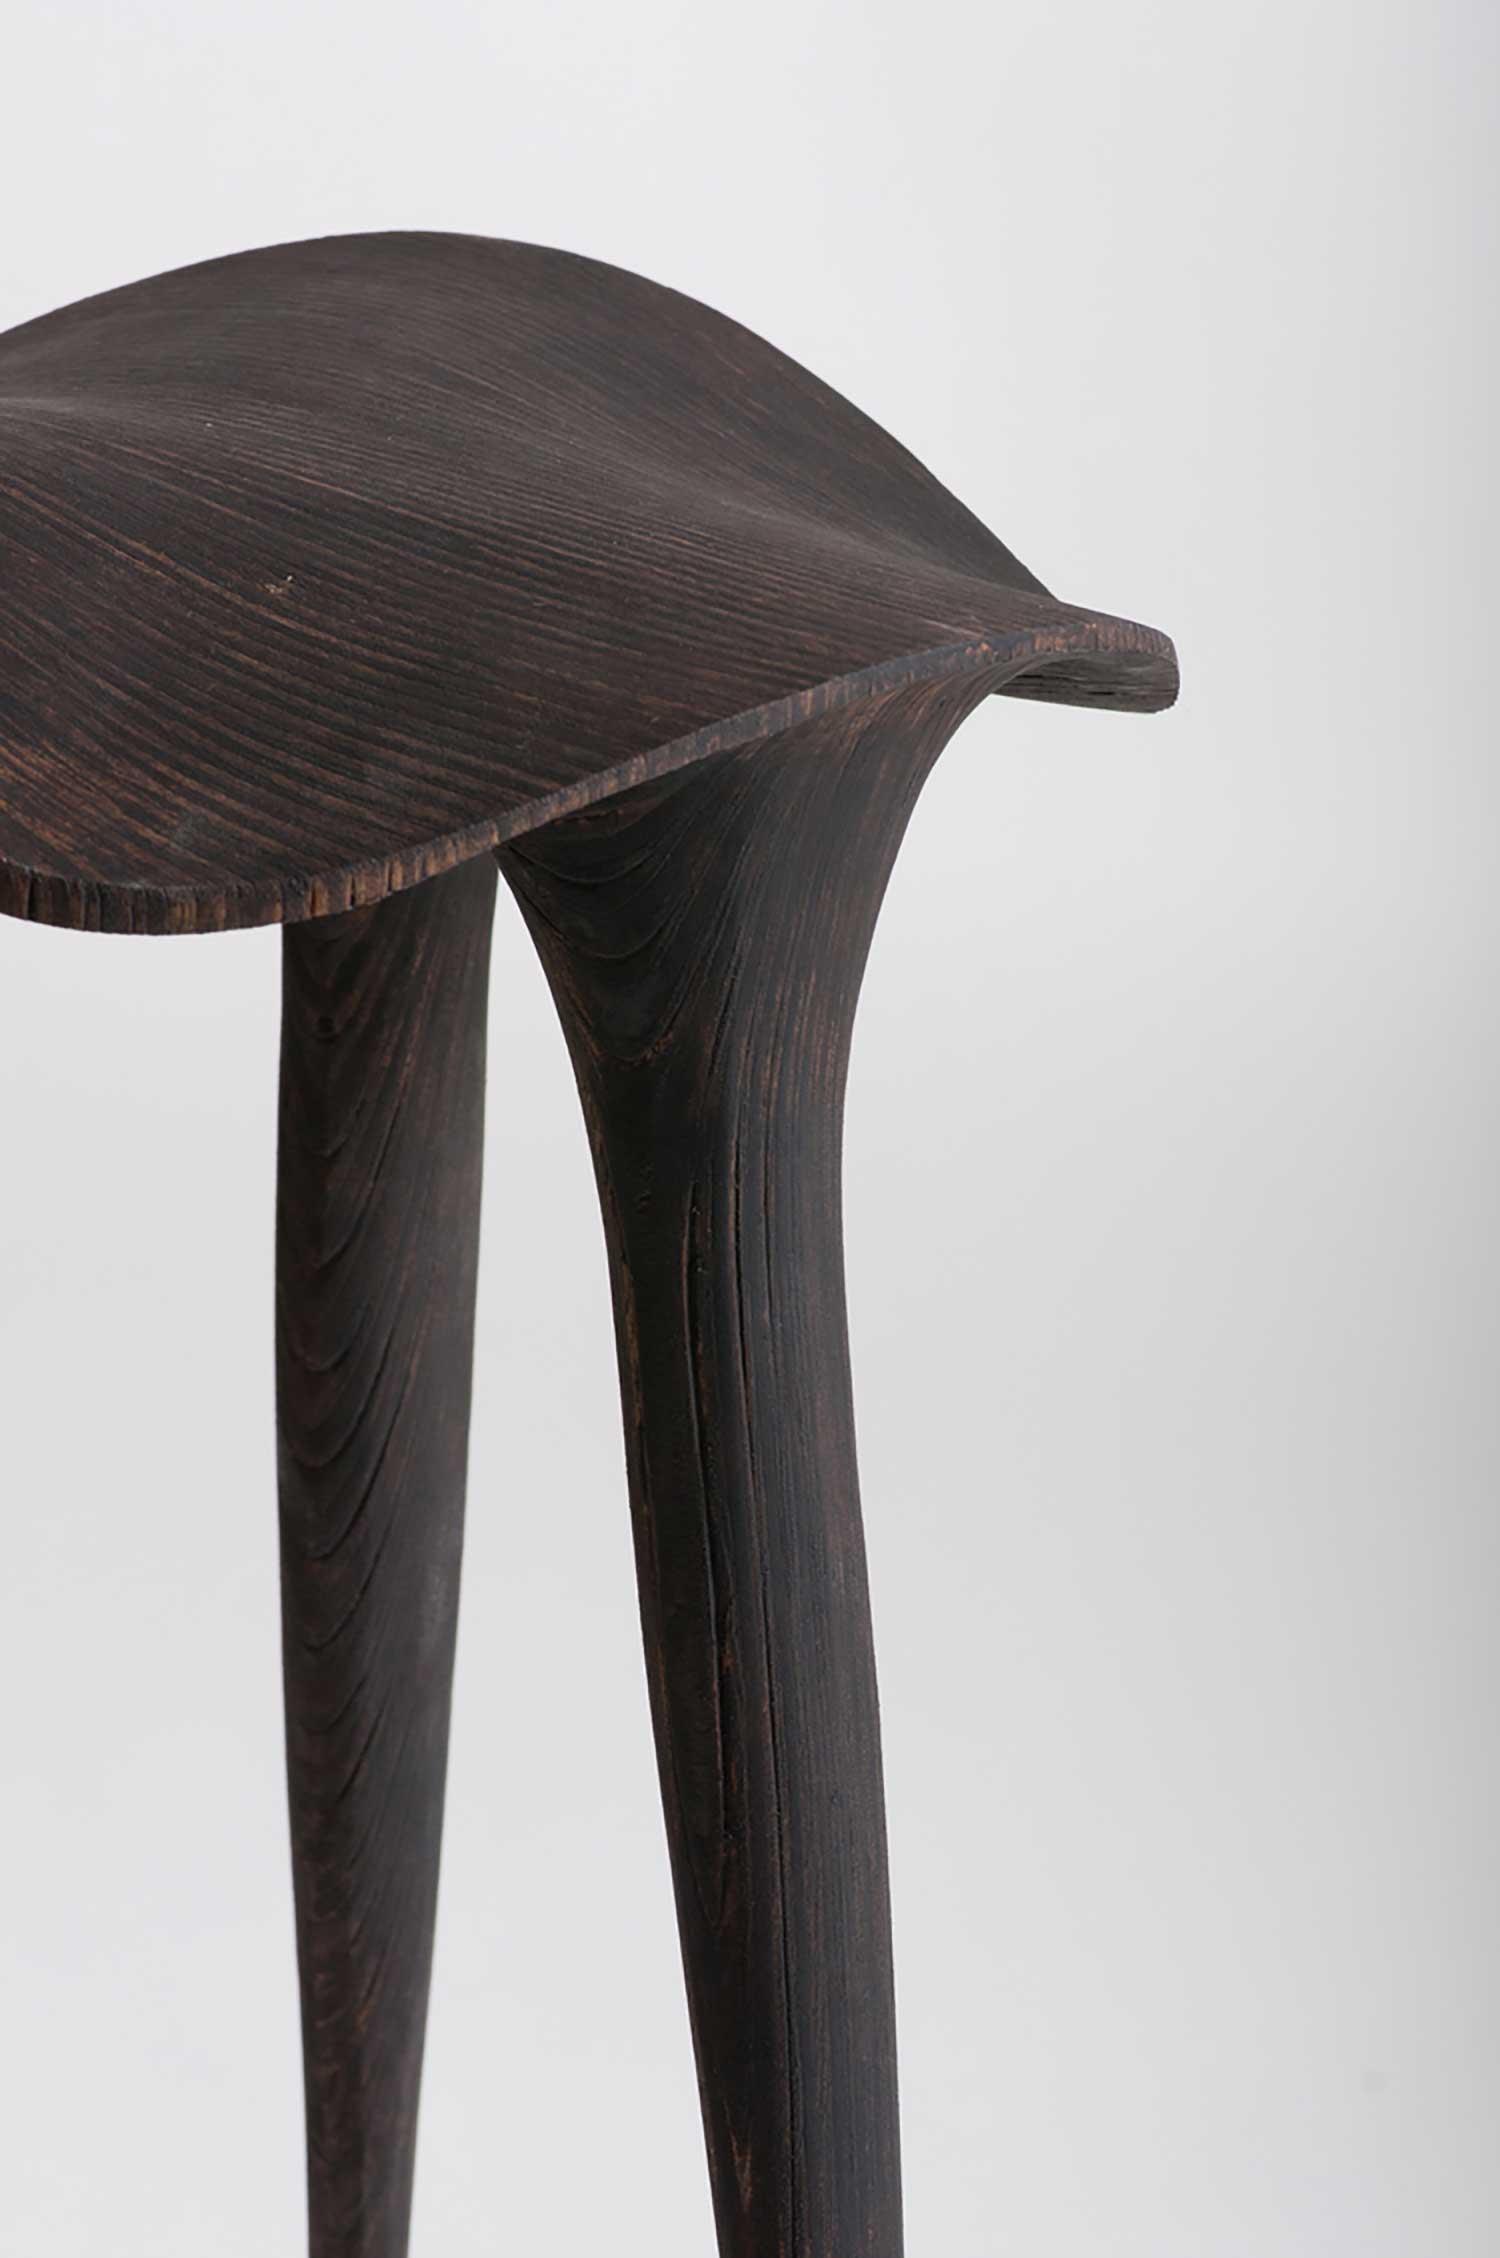 the-sadl-stool-5a